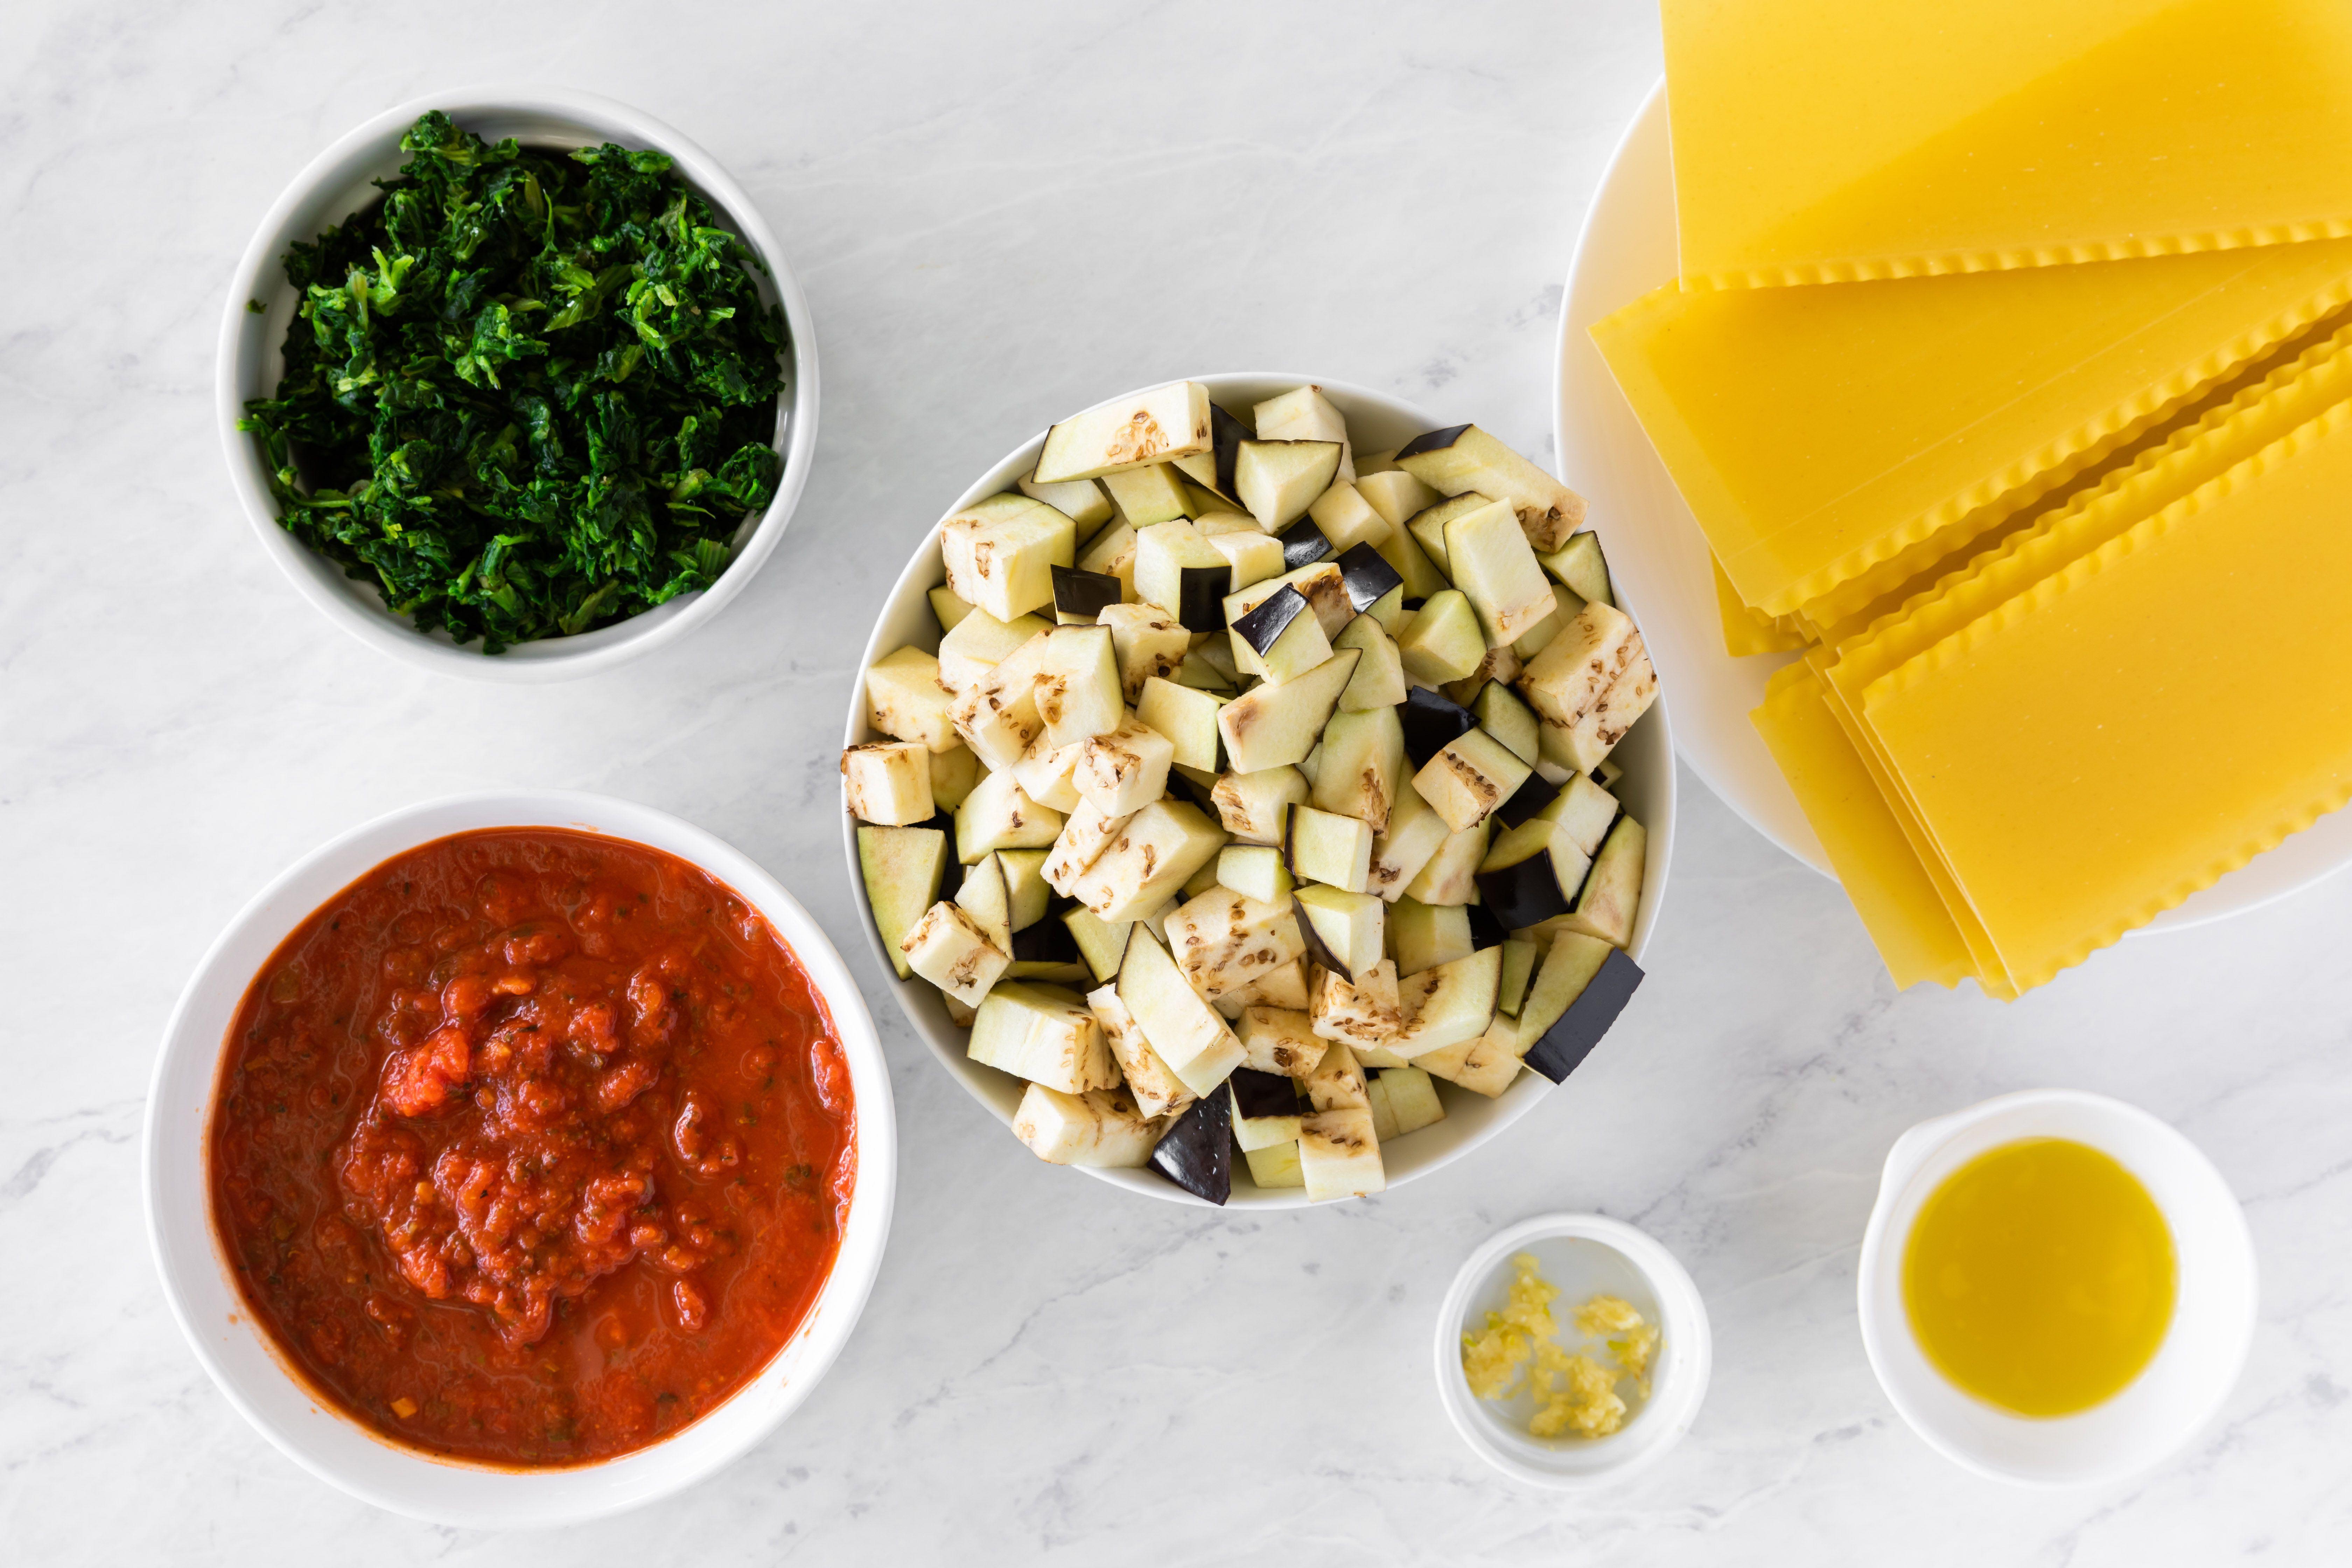 Ingredients for low fat vegan eggplant lasagna